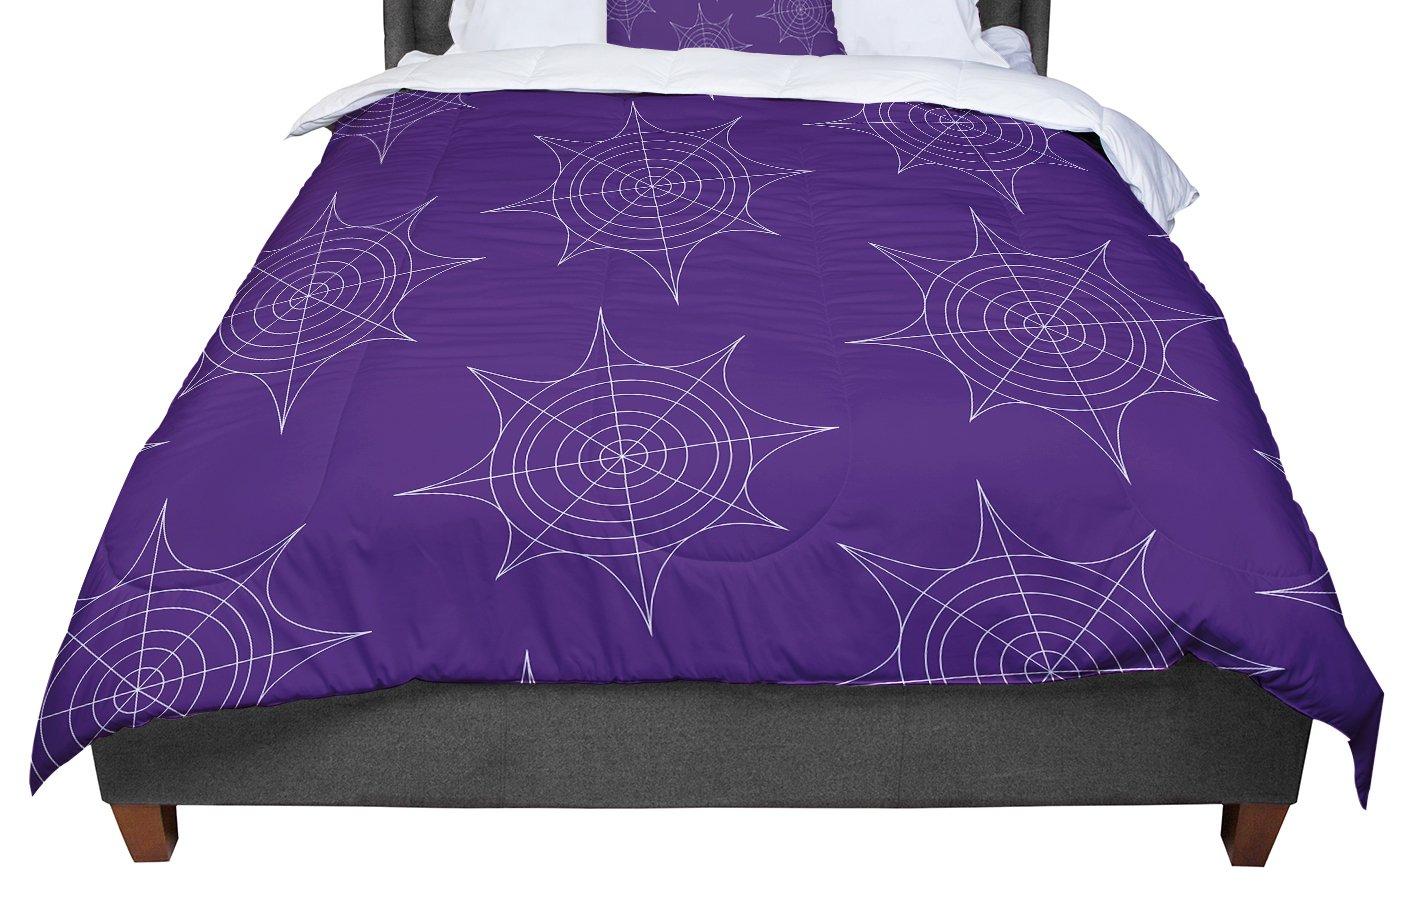 68 X 88 KESS InHouse Famenxt Octopus Flying Manta Rays Teal Green Twin Comforter